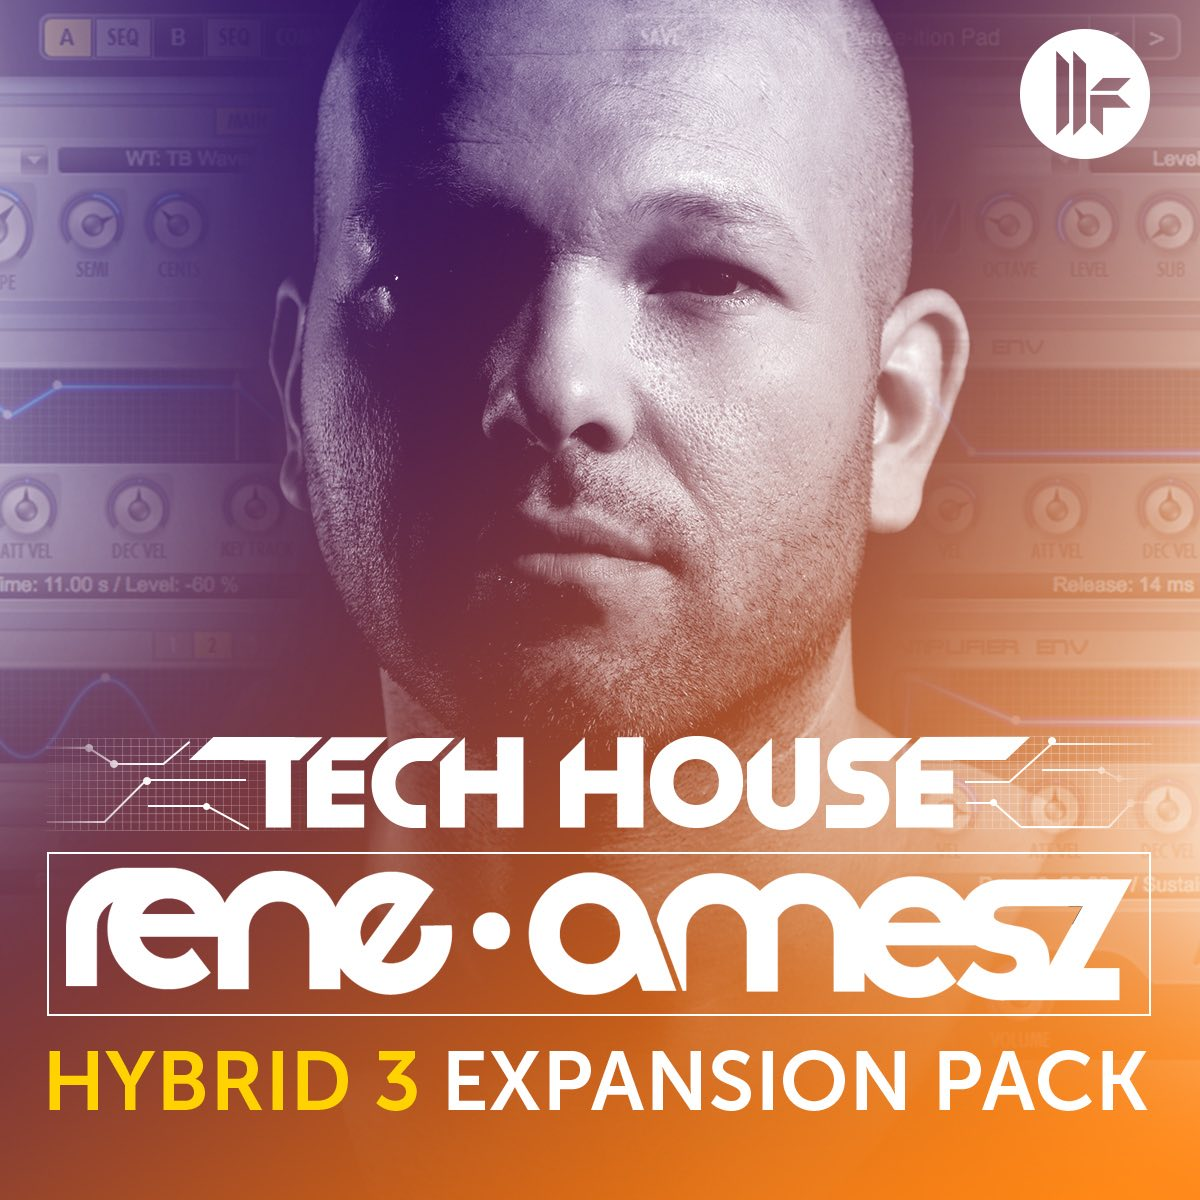 Rene Amesz Expansion for Hybrid 3